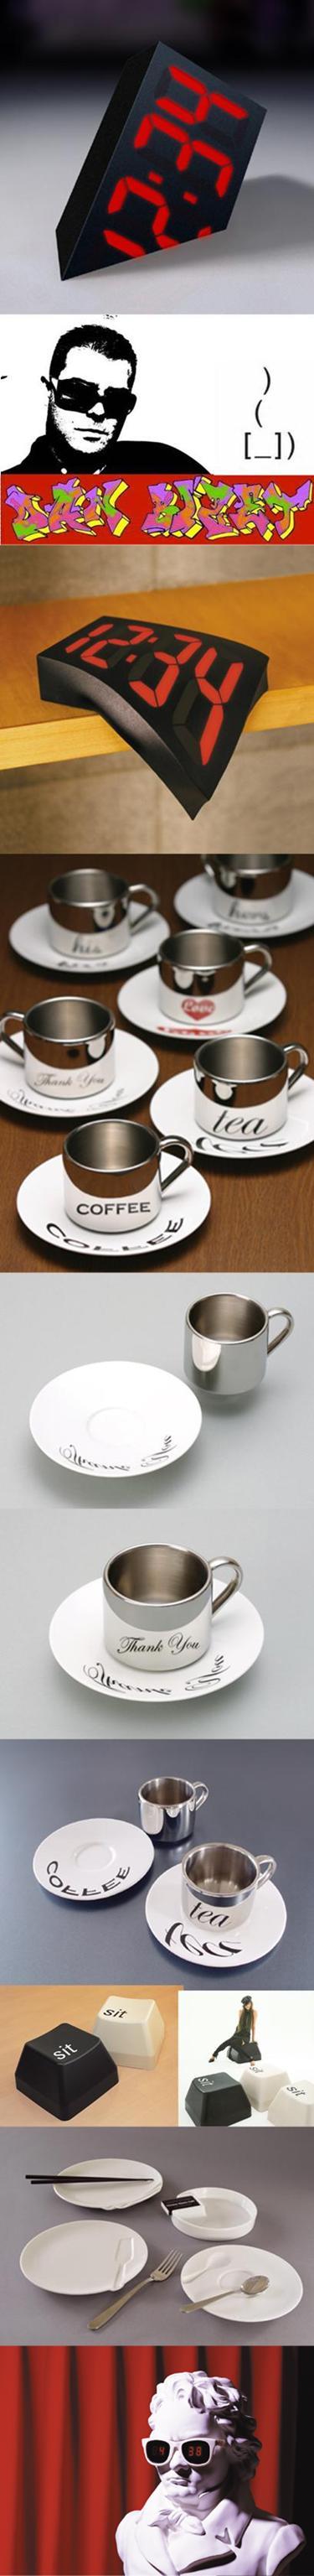 ross-mcbride-tasse-a-cafe-and-co2